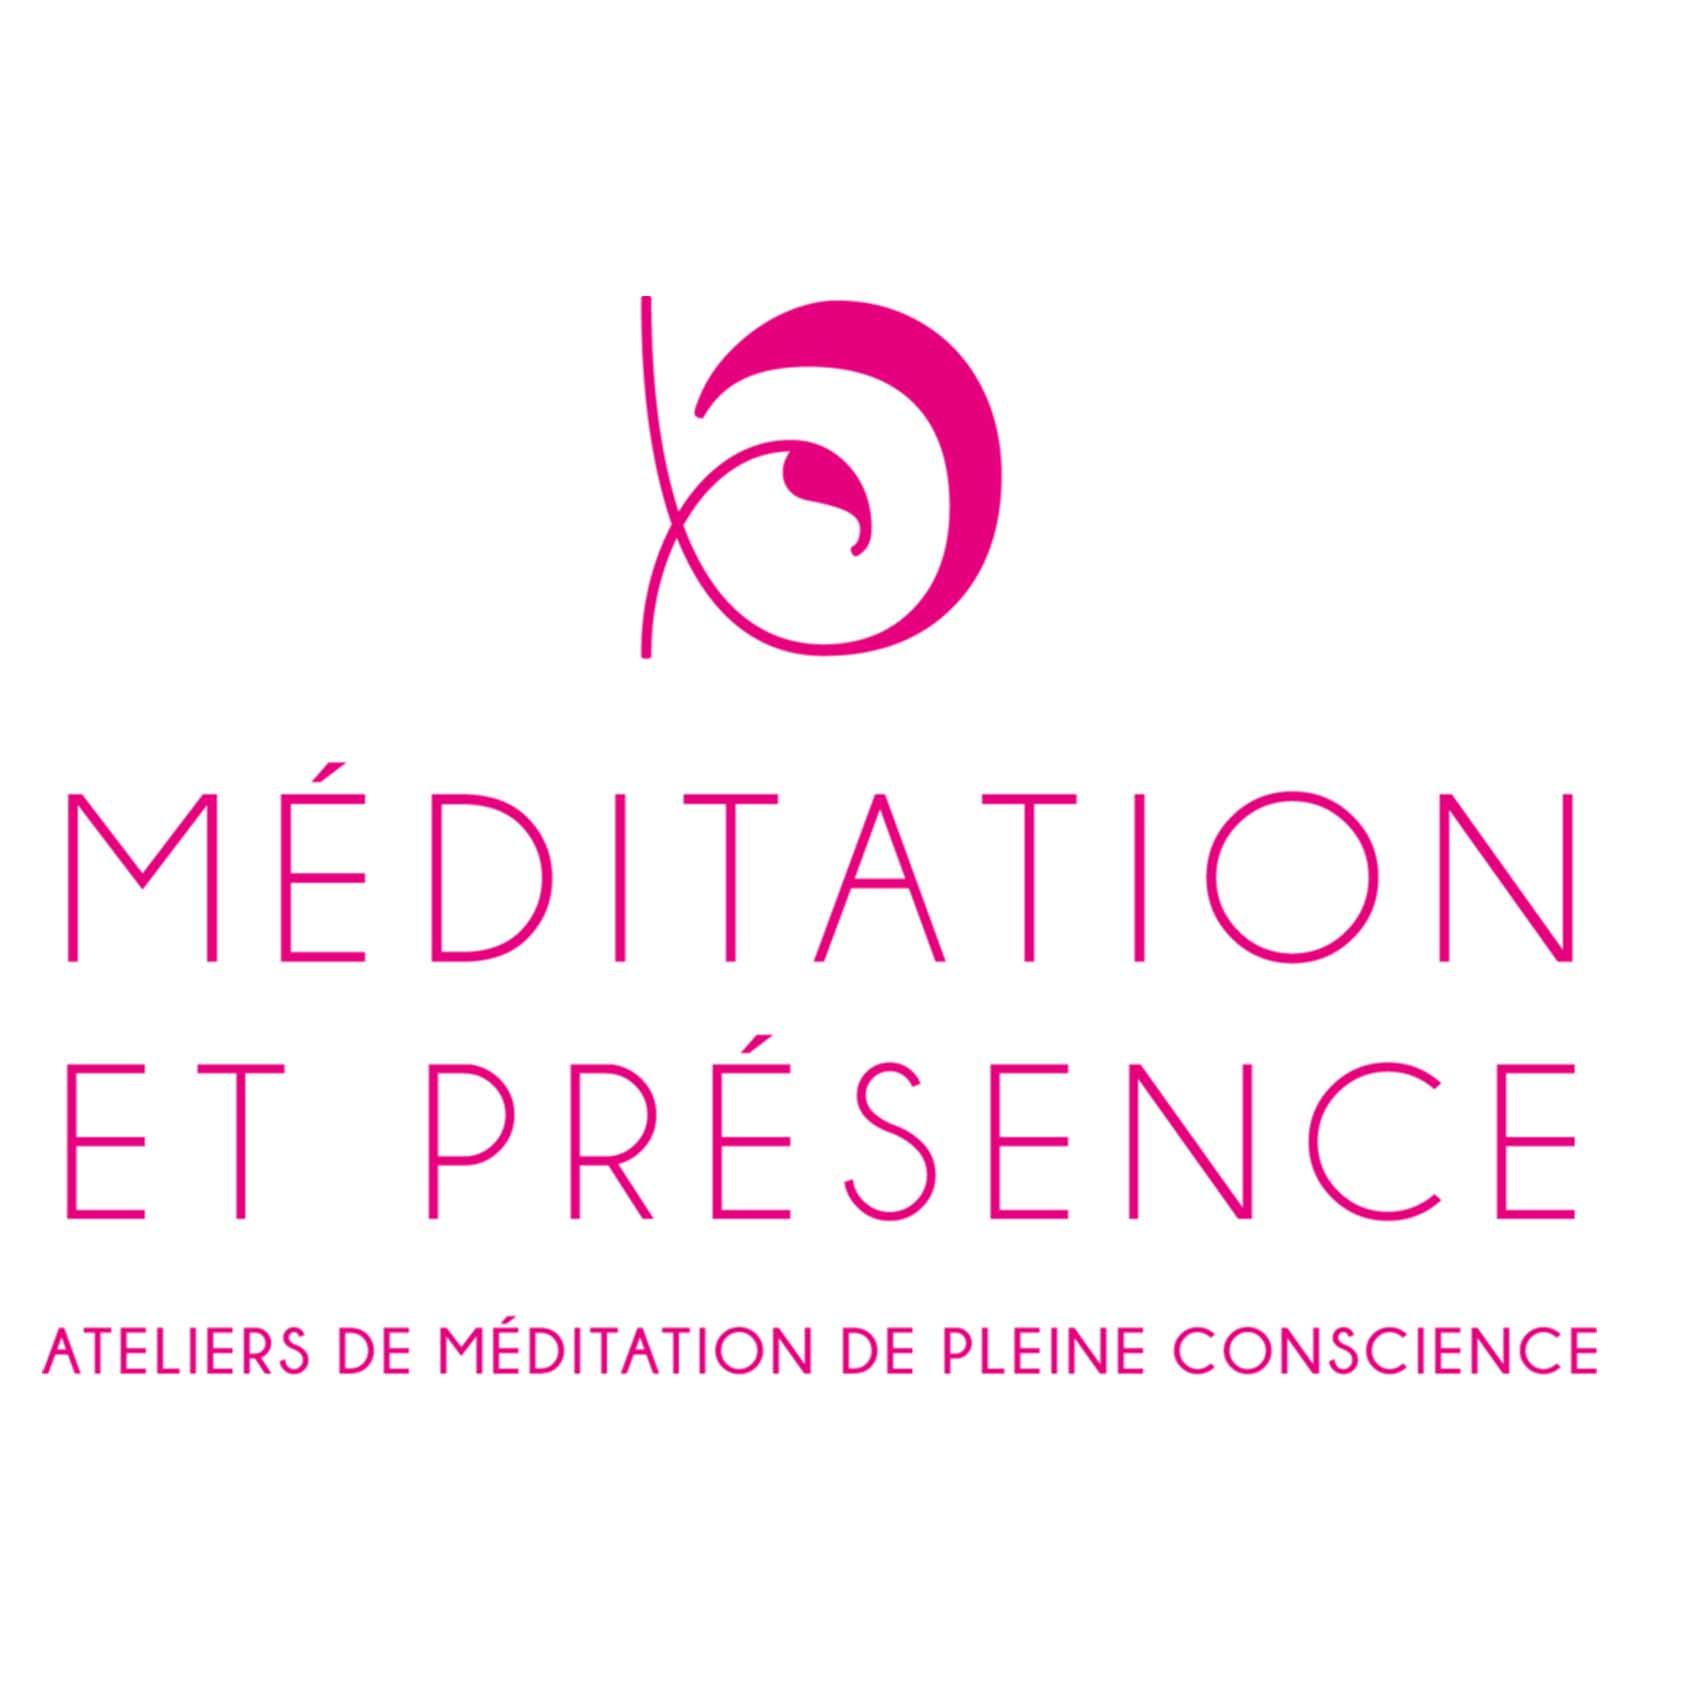 Logo méditation et présence